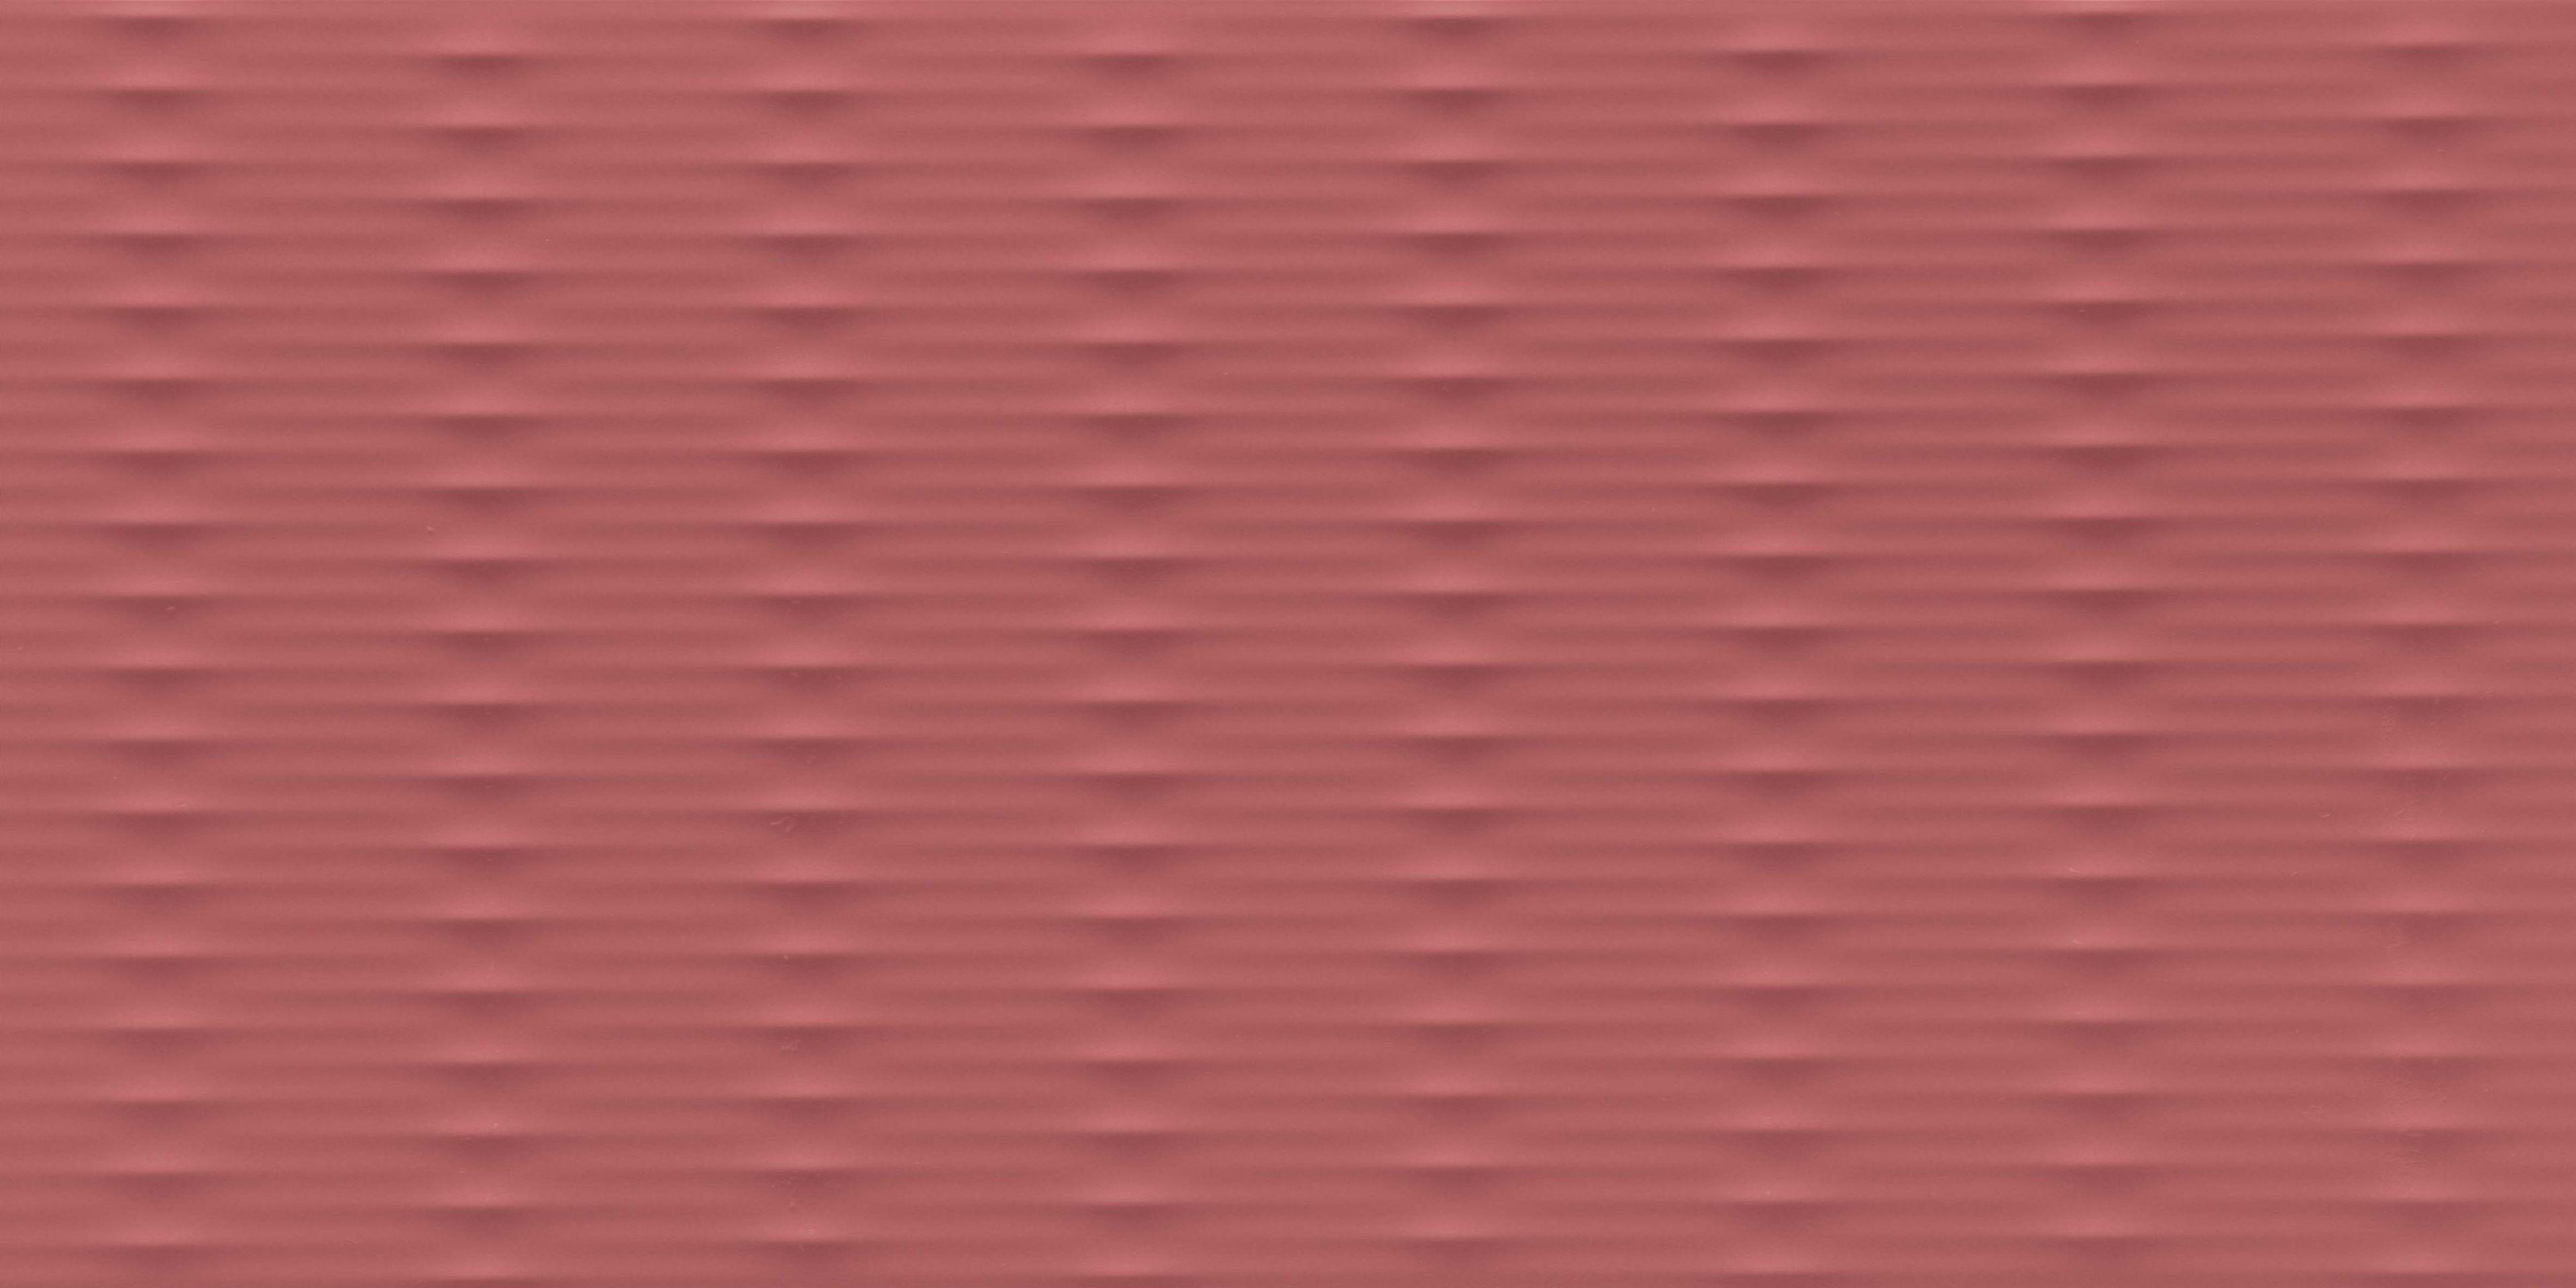 Risultati immagini per color flow supergres struttura drop cardinal